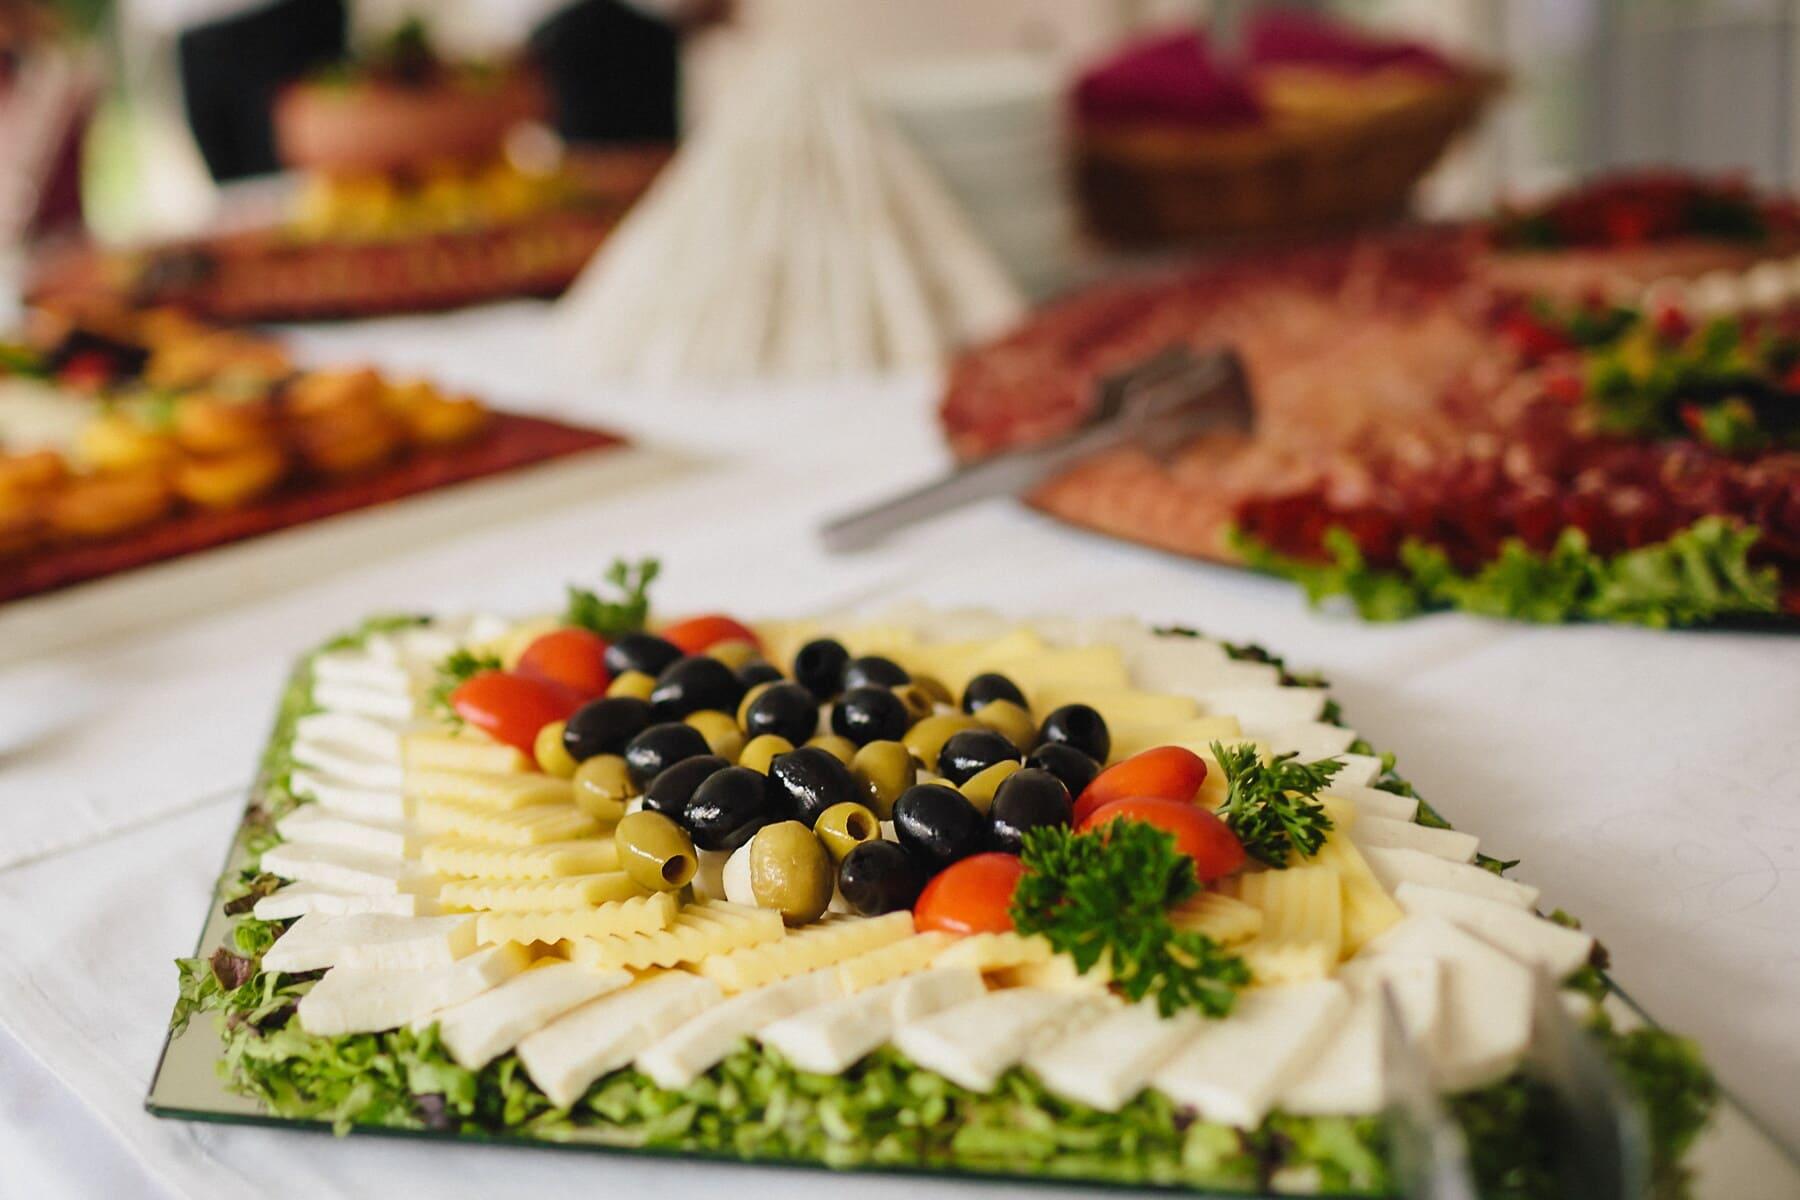 olive, black, cheese, mozzarella, plate, salad, dish, dinner, vegetable, appetizer